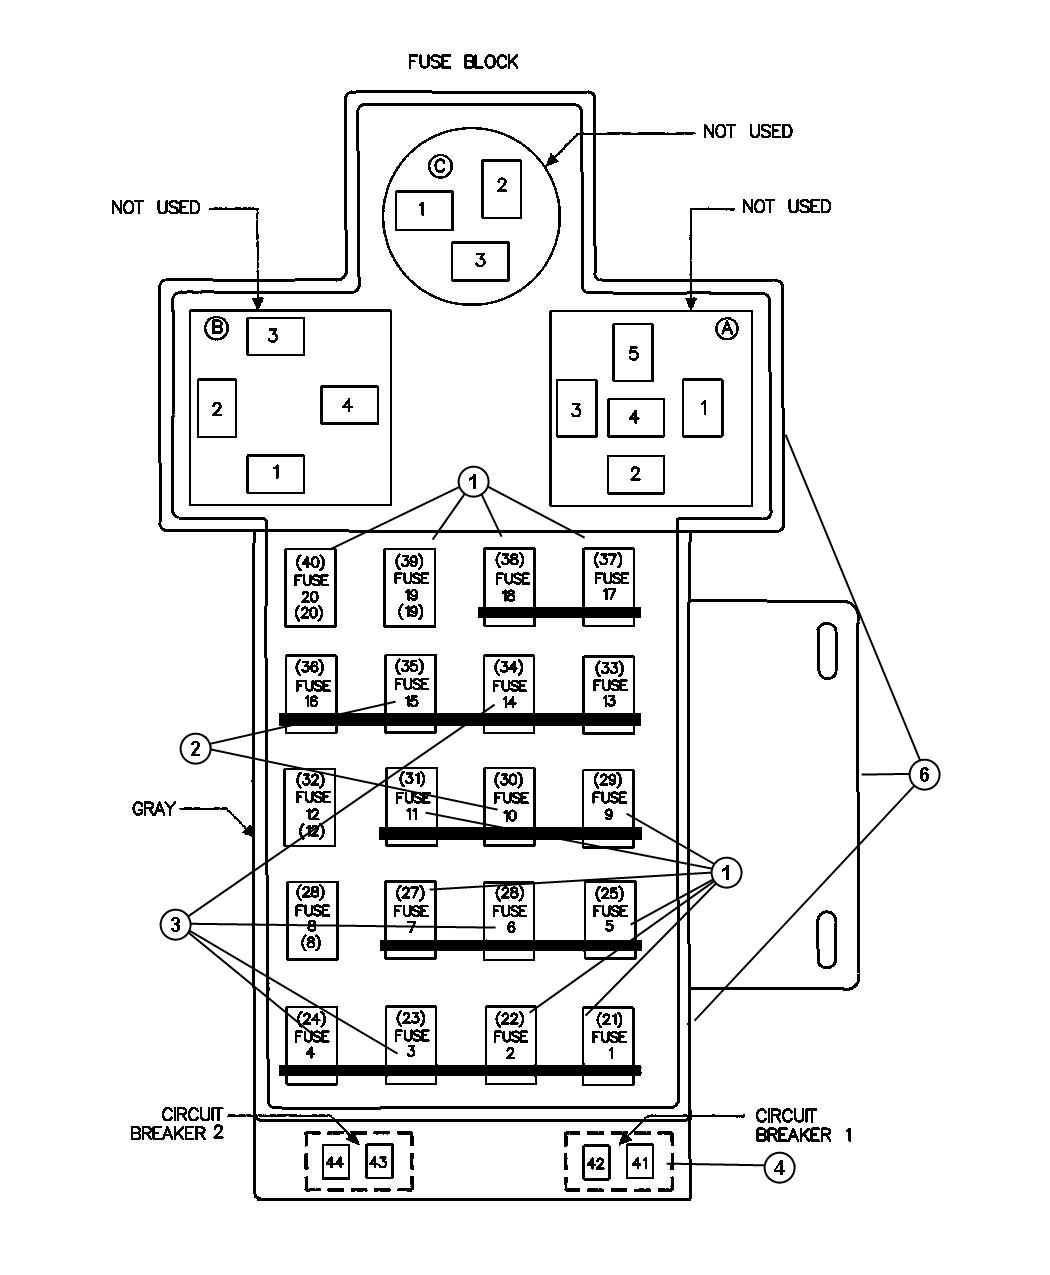 Jeep Wrangler Breaker Circuit 20 Amp 20 Amp Fuse Base